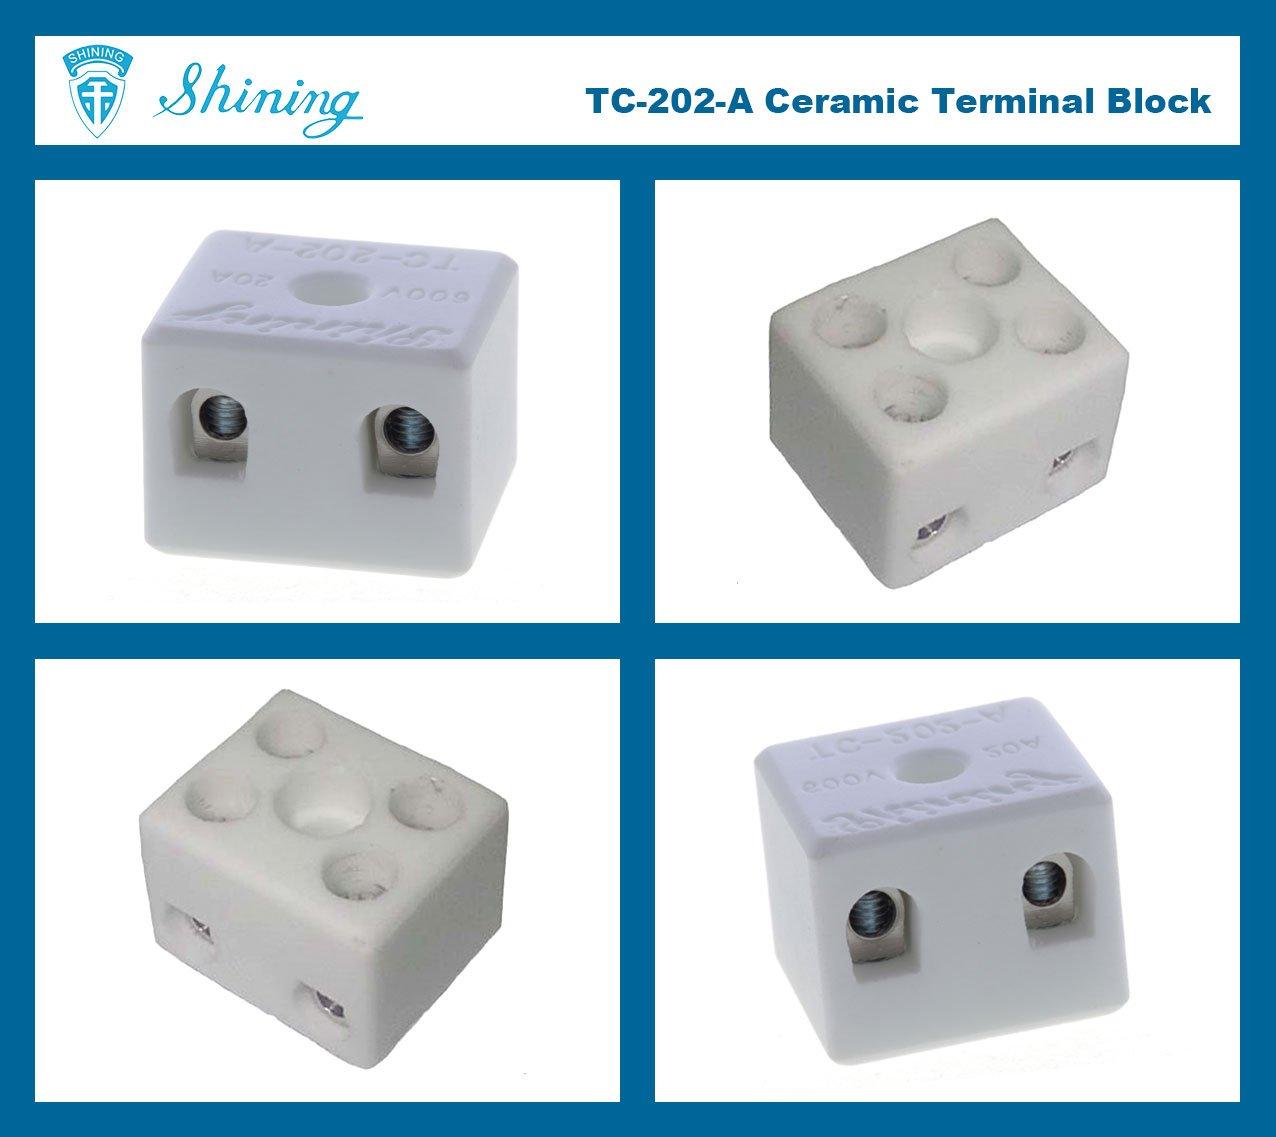 TC-202-A Panel Mounted 600V 20A 2 Pole Ceramic Terminal Block